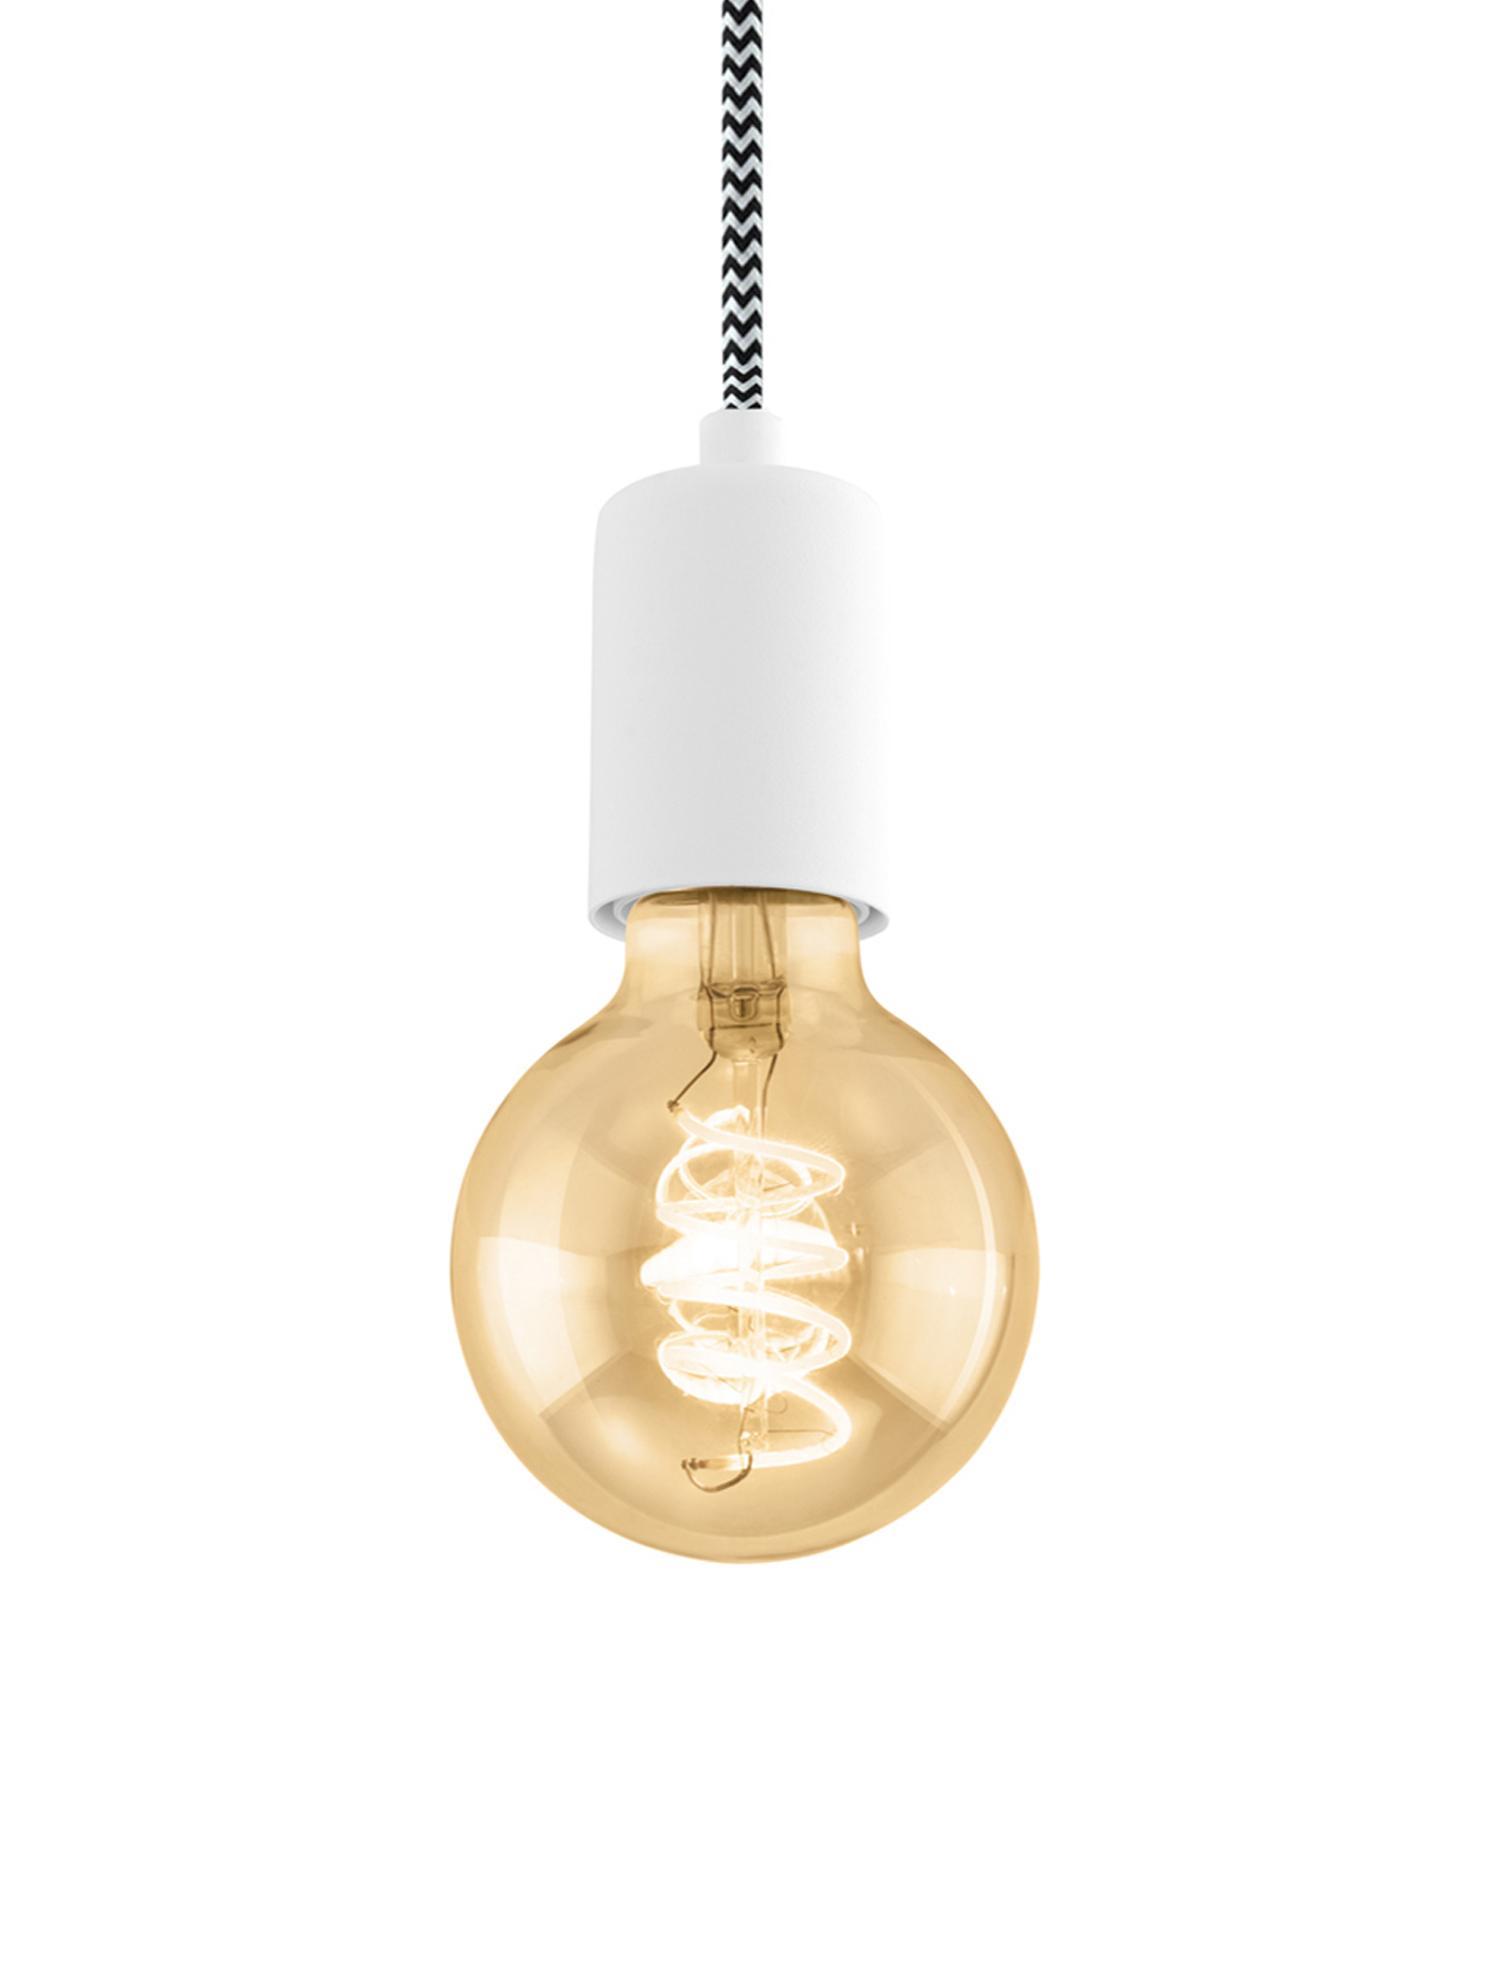 Lampada a sospensione Trey, Baldacchino: metallo verniciato a polv, Bianco opaco, Ø 10 x Alt. 8 cm